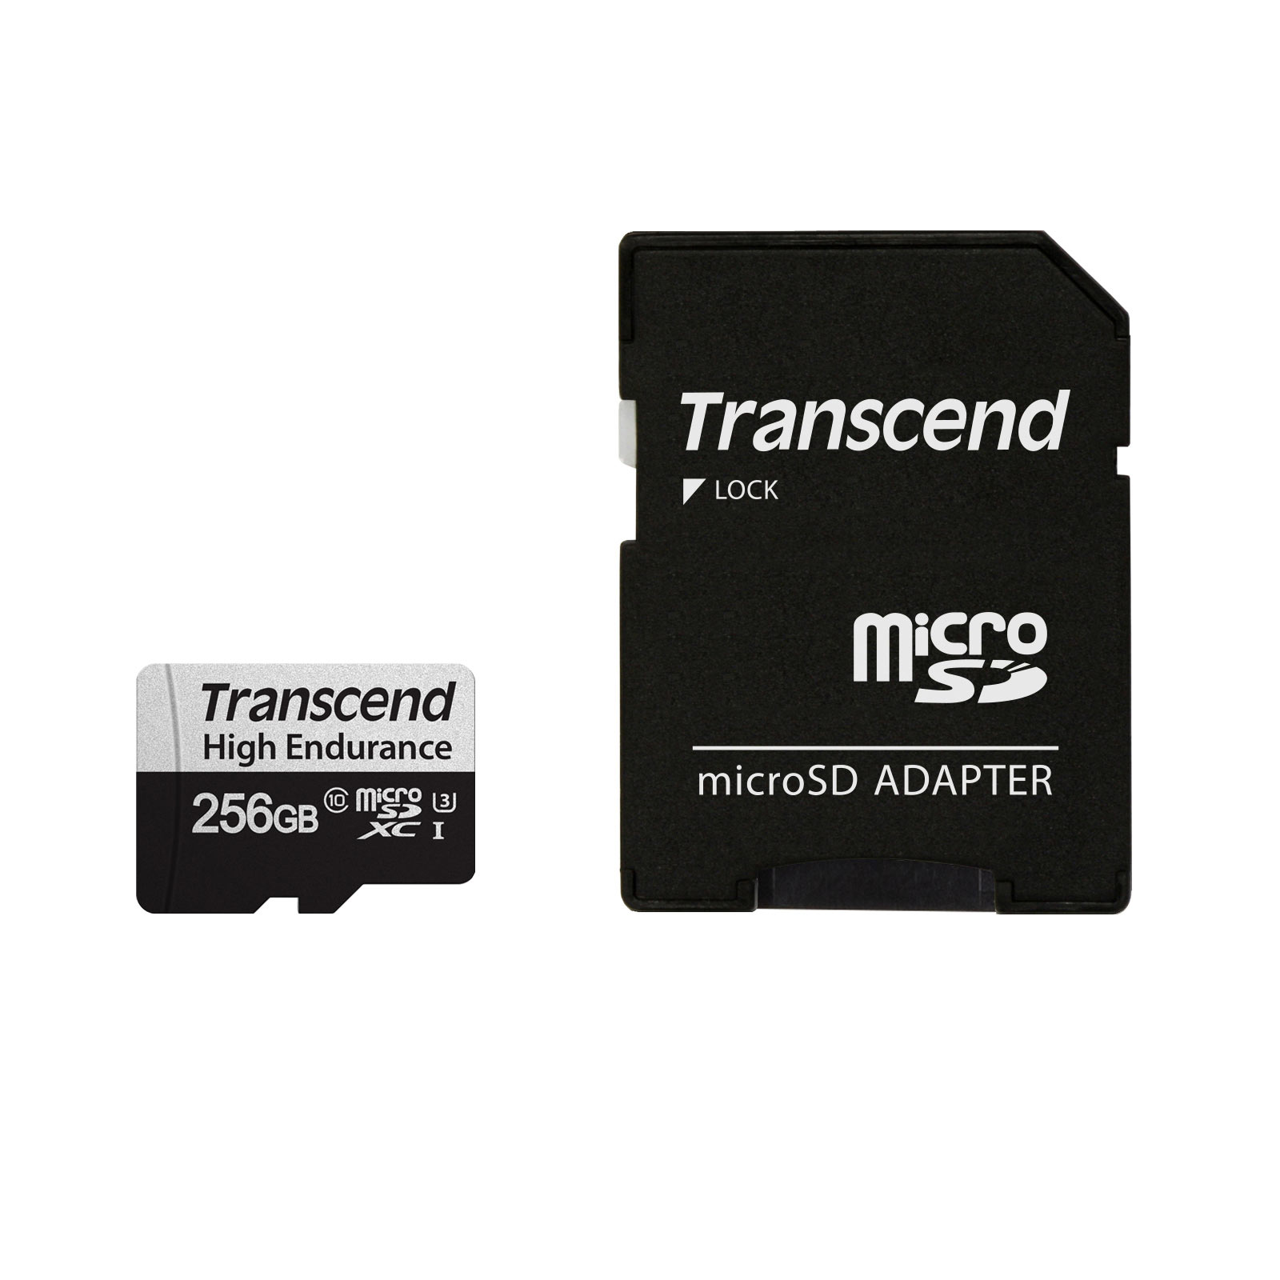 TS256GUSD350V 国内在庫 超歓迎された トランセンド ネコポス対応 送料無料 Transcend microSDXCカード 256GB 高耐久 セキュリティカメラ Class1UHS-I ドライブレコーダー U3 SDカード変換アダプタ付